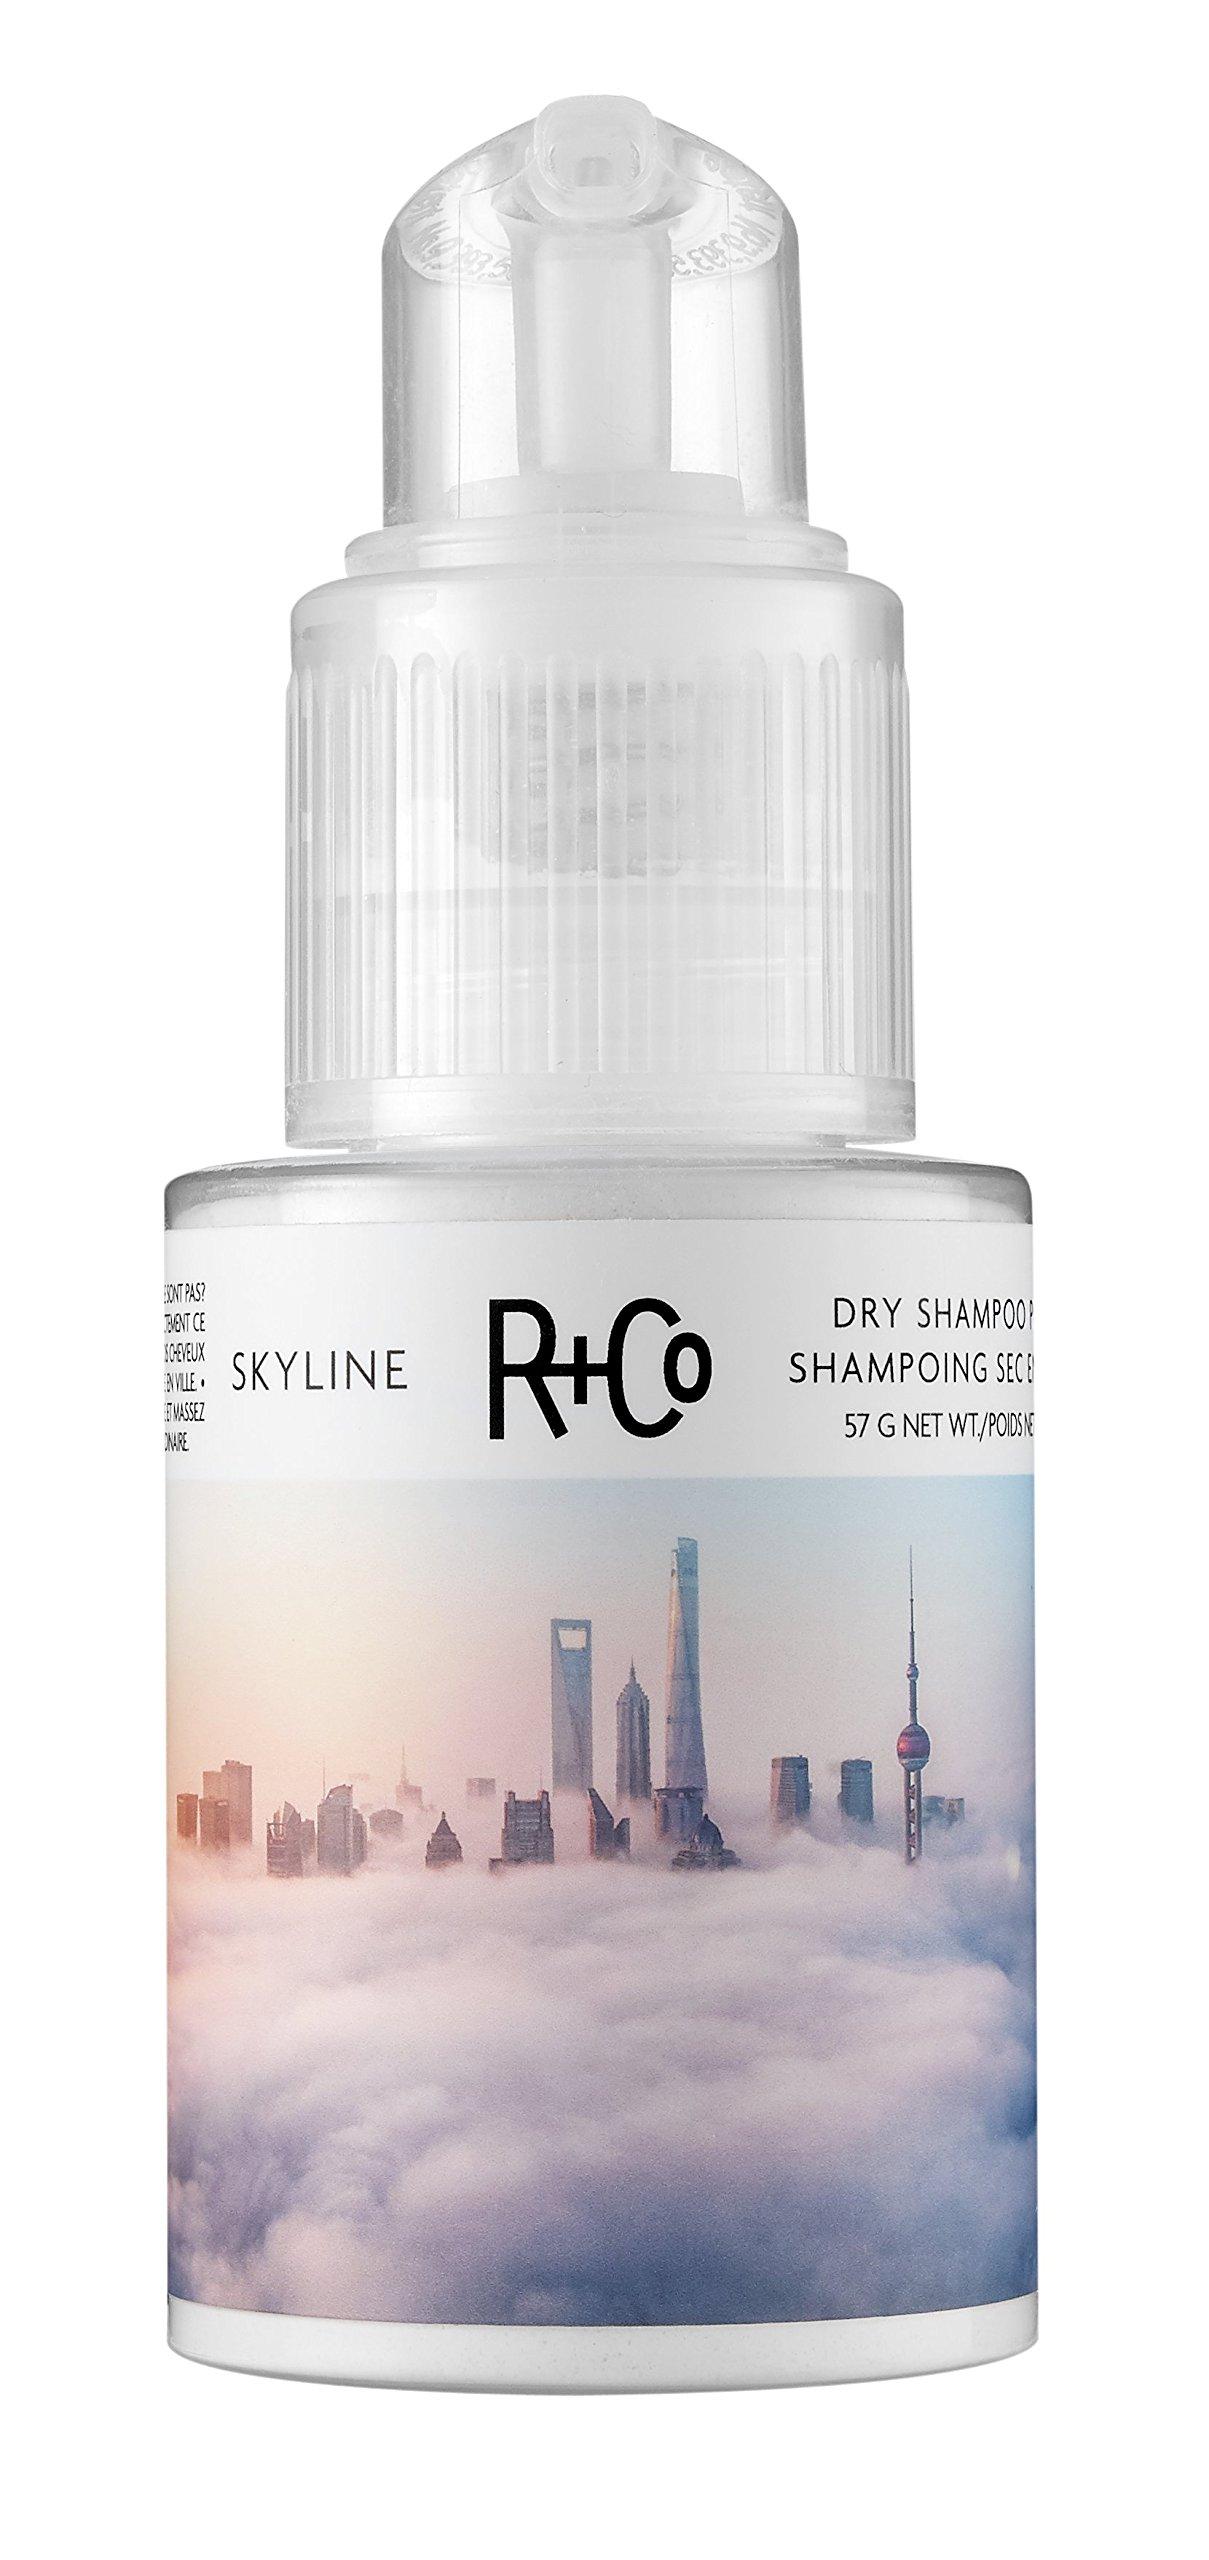 R+Co Skyline Dry Shampoo Powder, 2 oz by R+Co